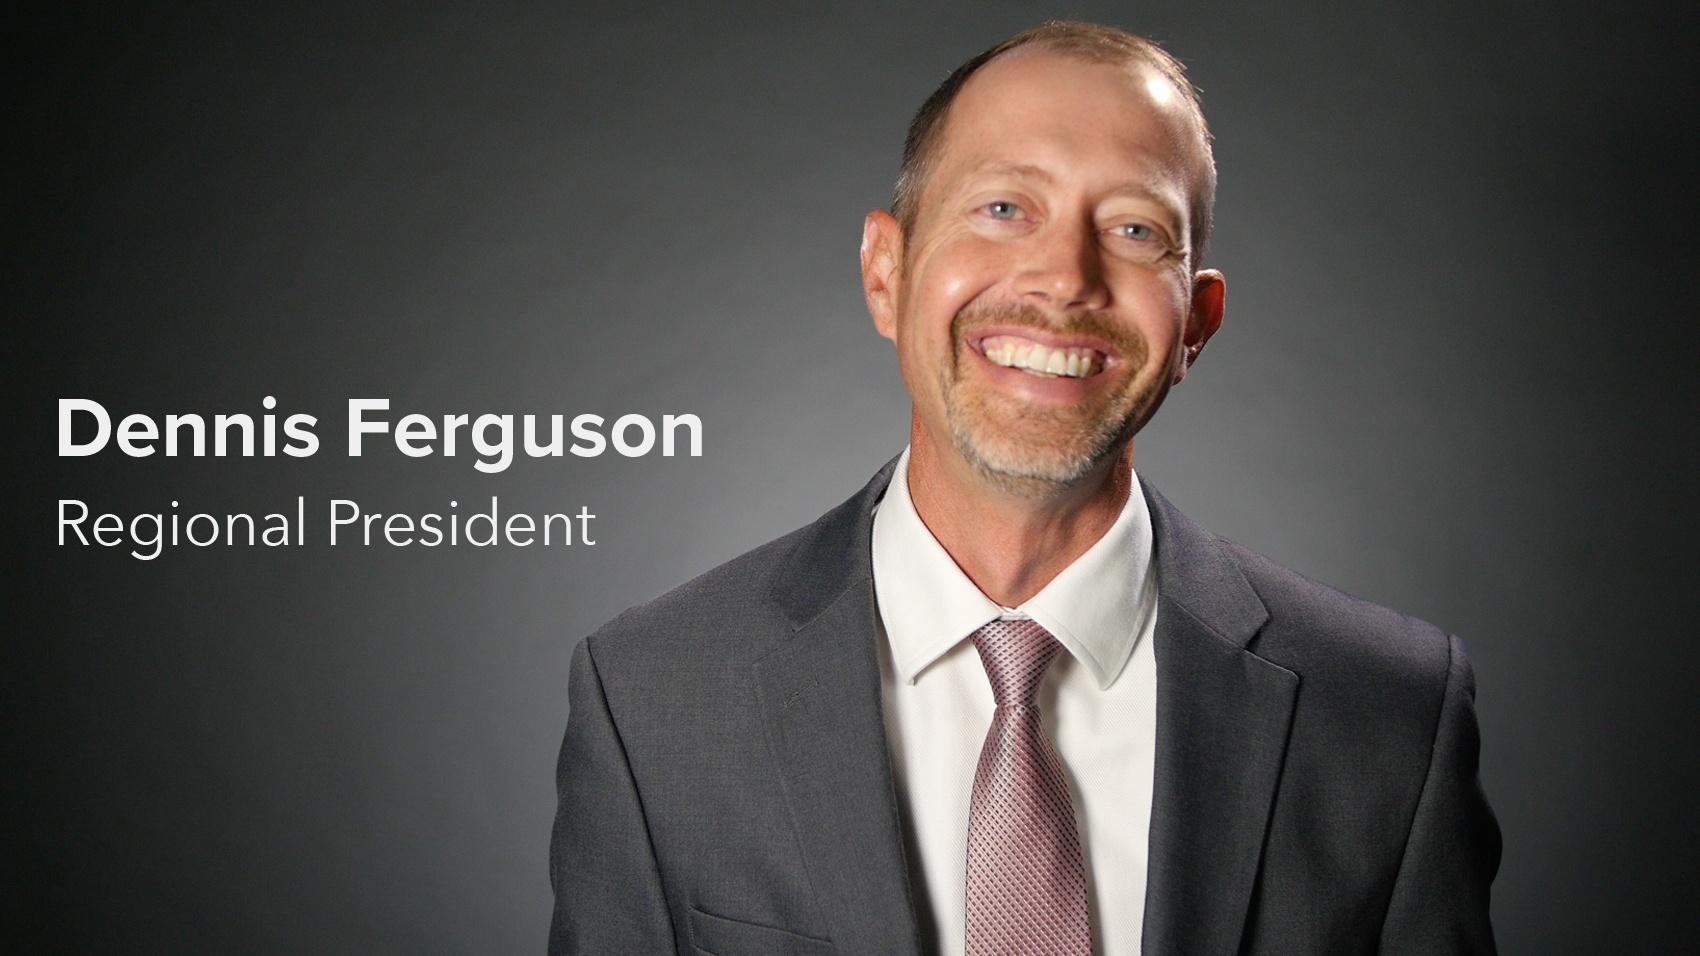 DennisFerguson_VideoTB_Title